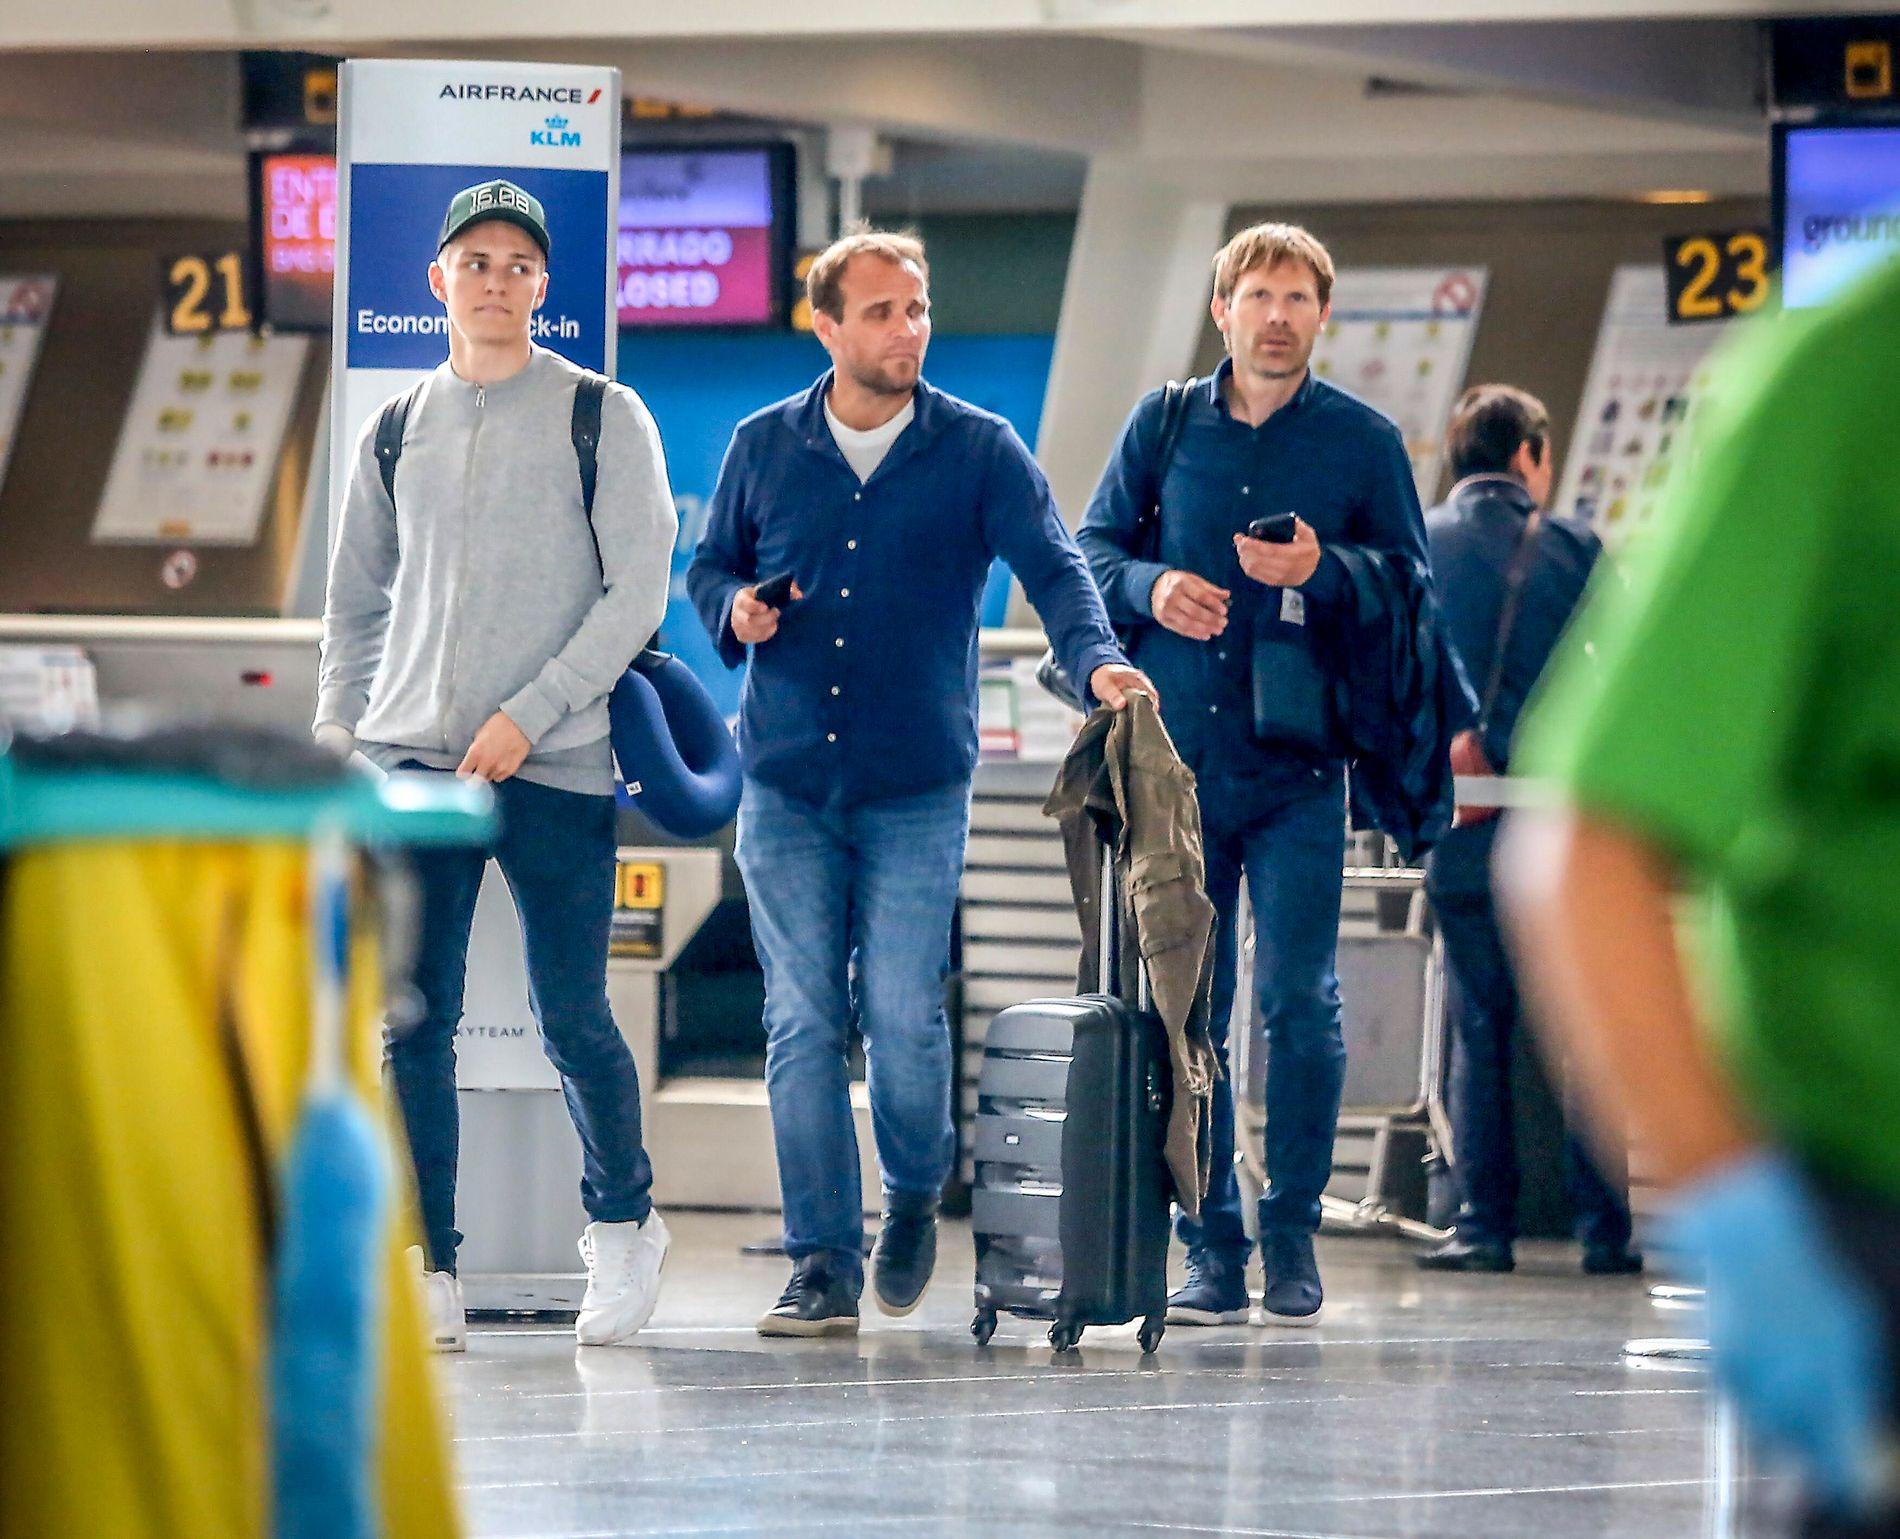 STYRER I KULISSENE: Bjørn Tore Kvarme (t.h.) er Martin Ødegaards agent. Her med pappa Hans Erik på flyplassen i Bilbao i forkant av utlånet til Real Sociedad i sommer.